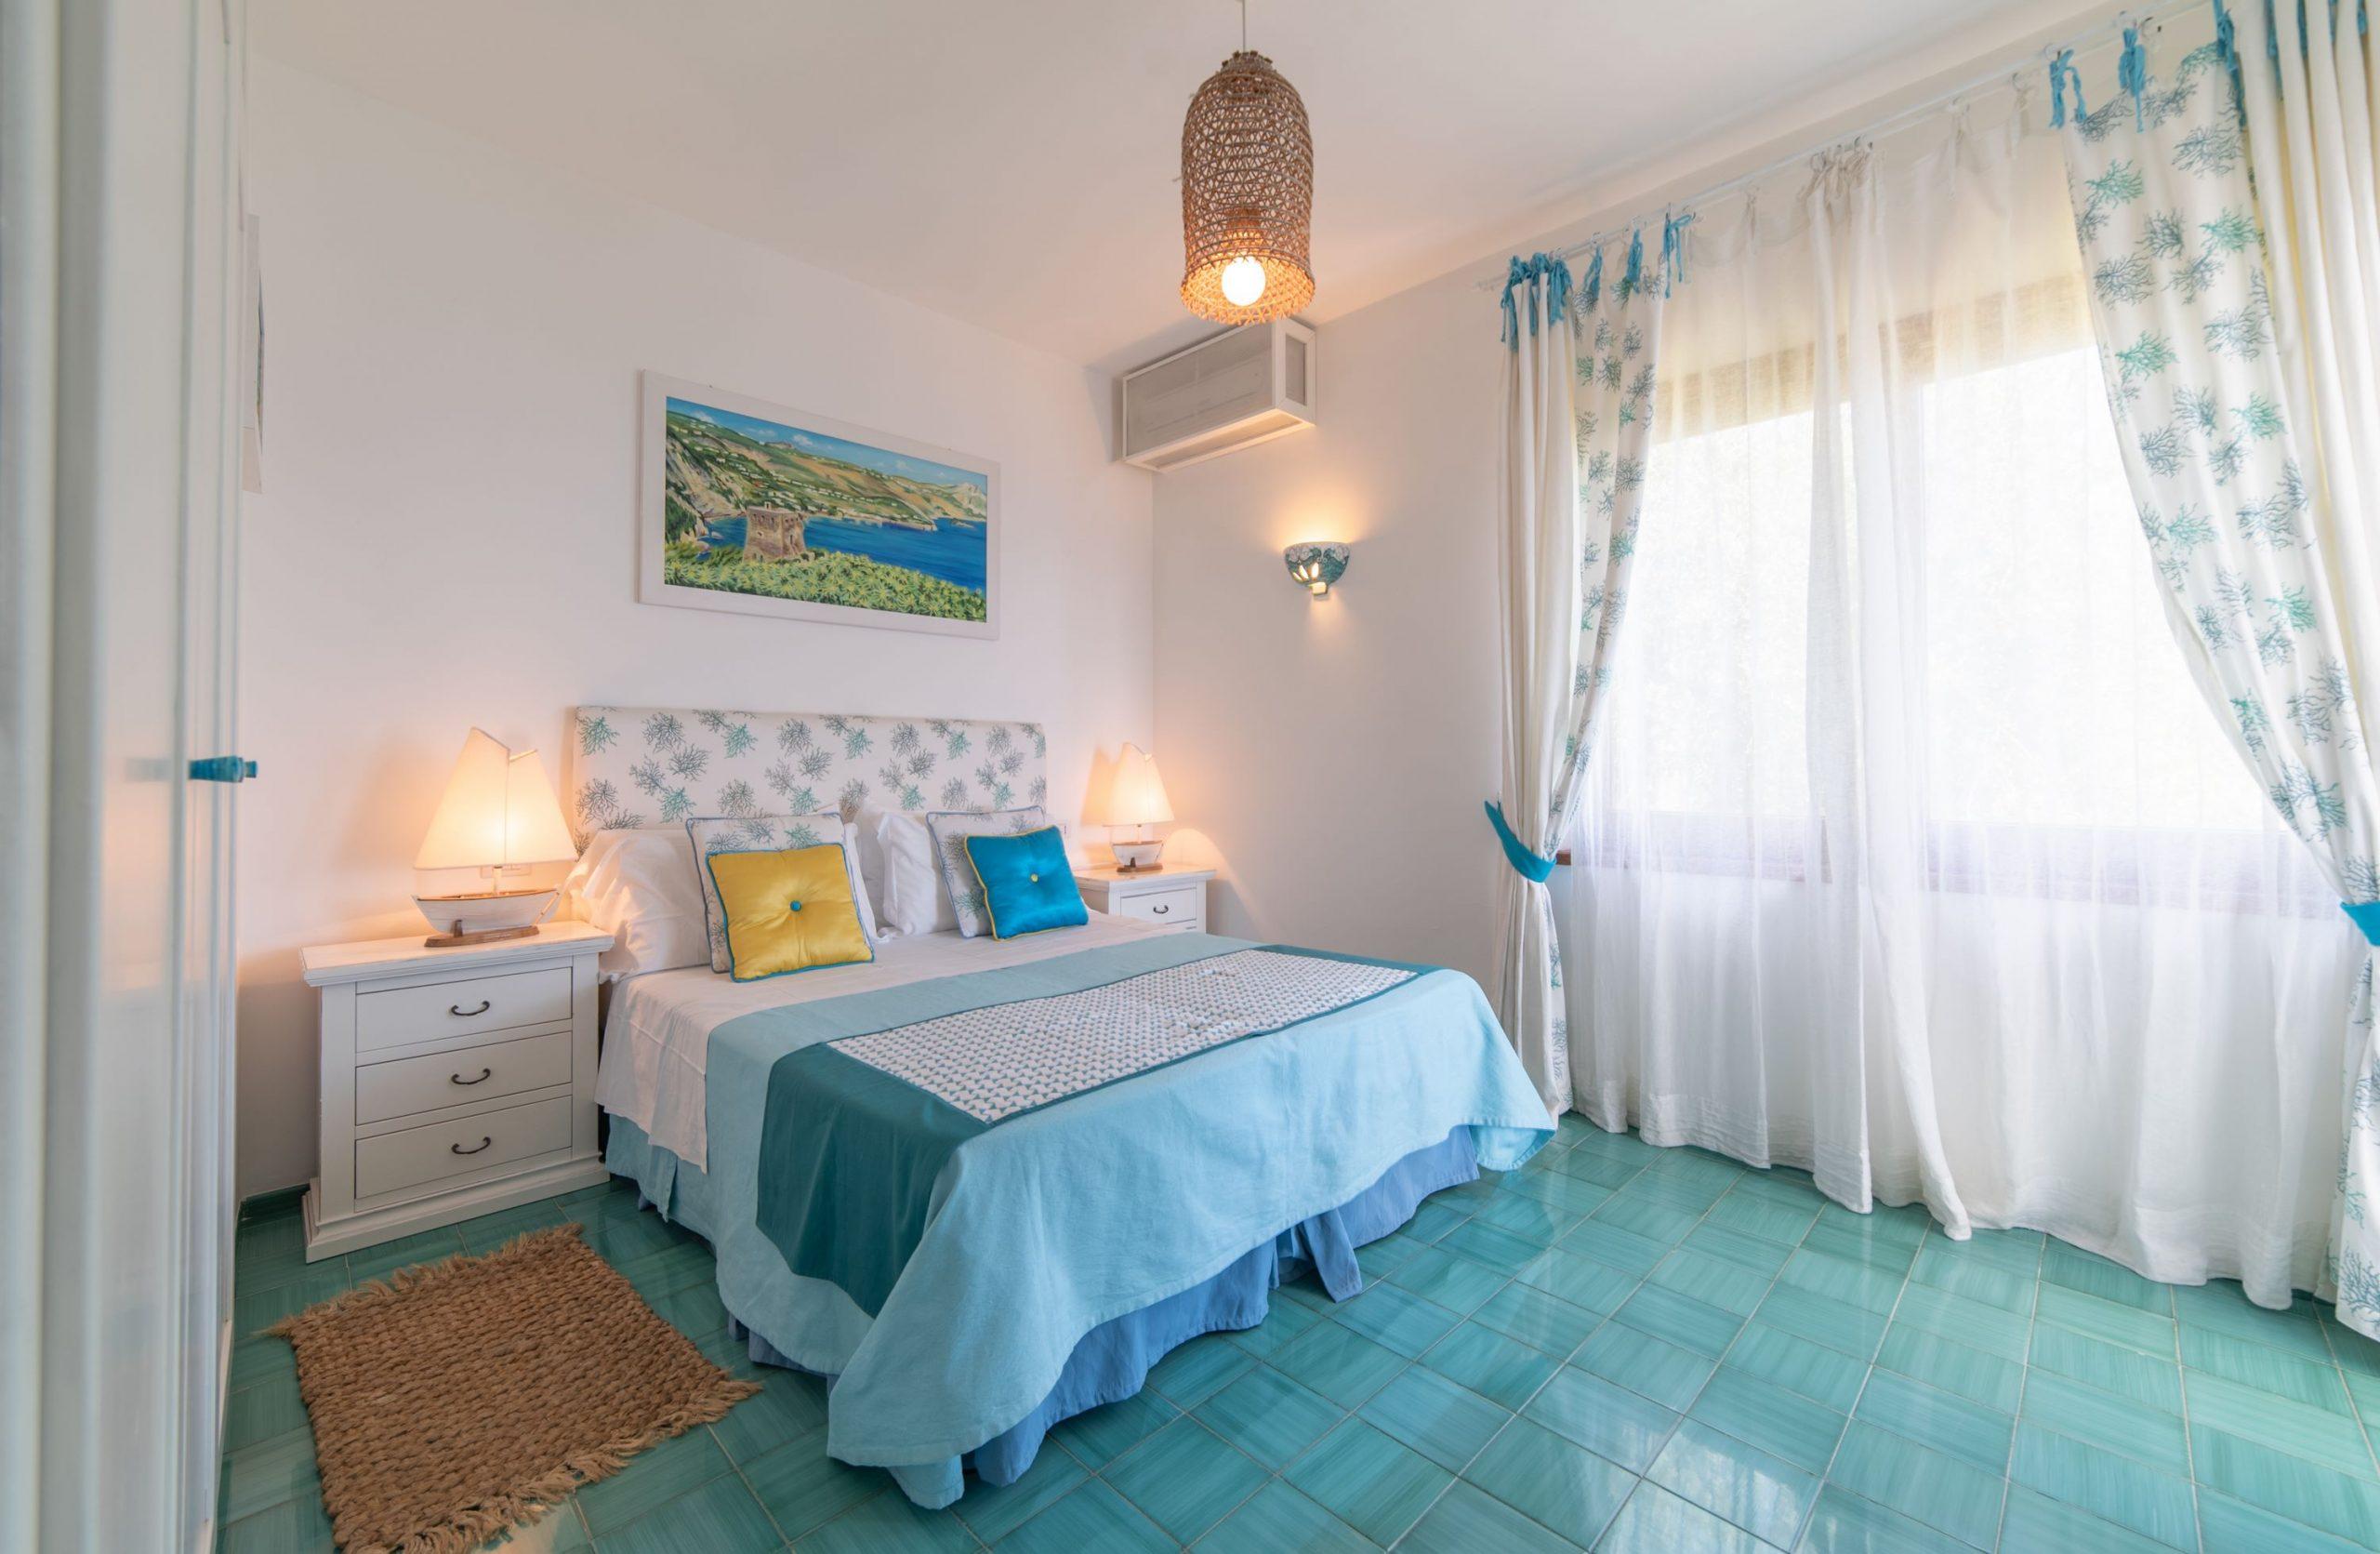 Villa Sorrento Coast with swimming pool Bedroom